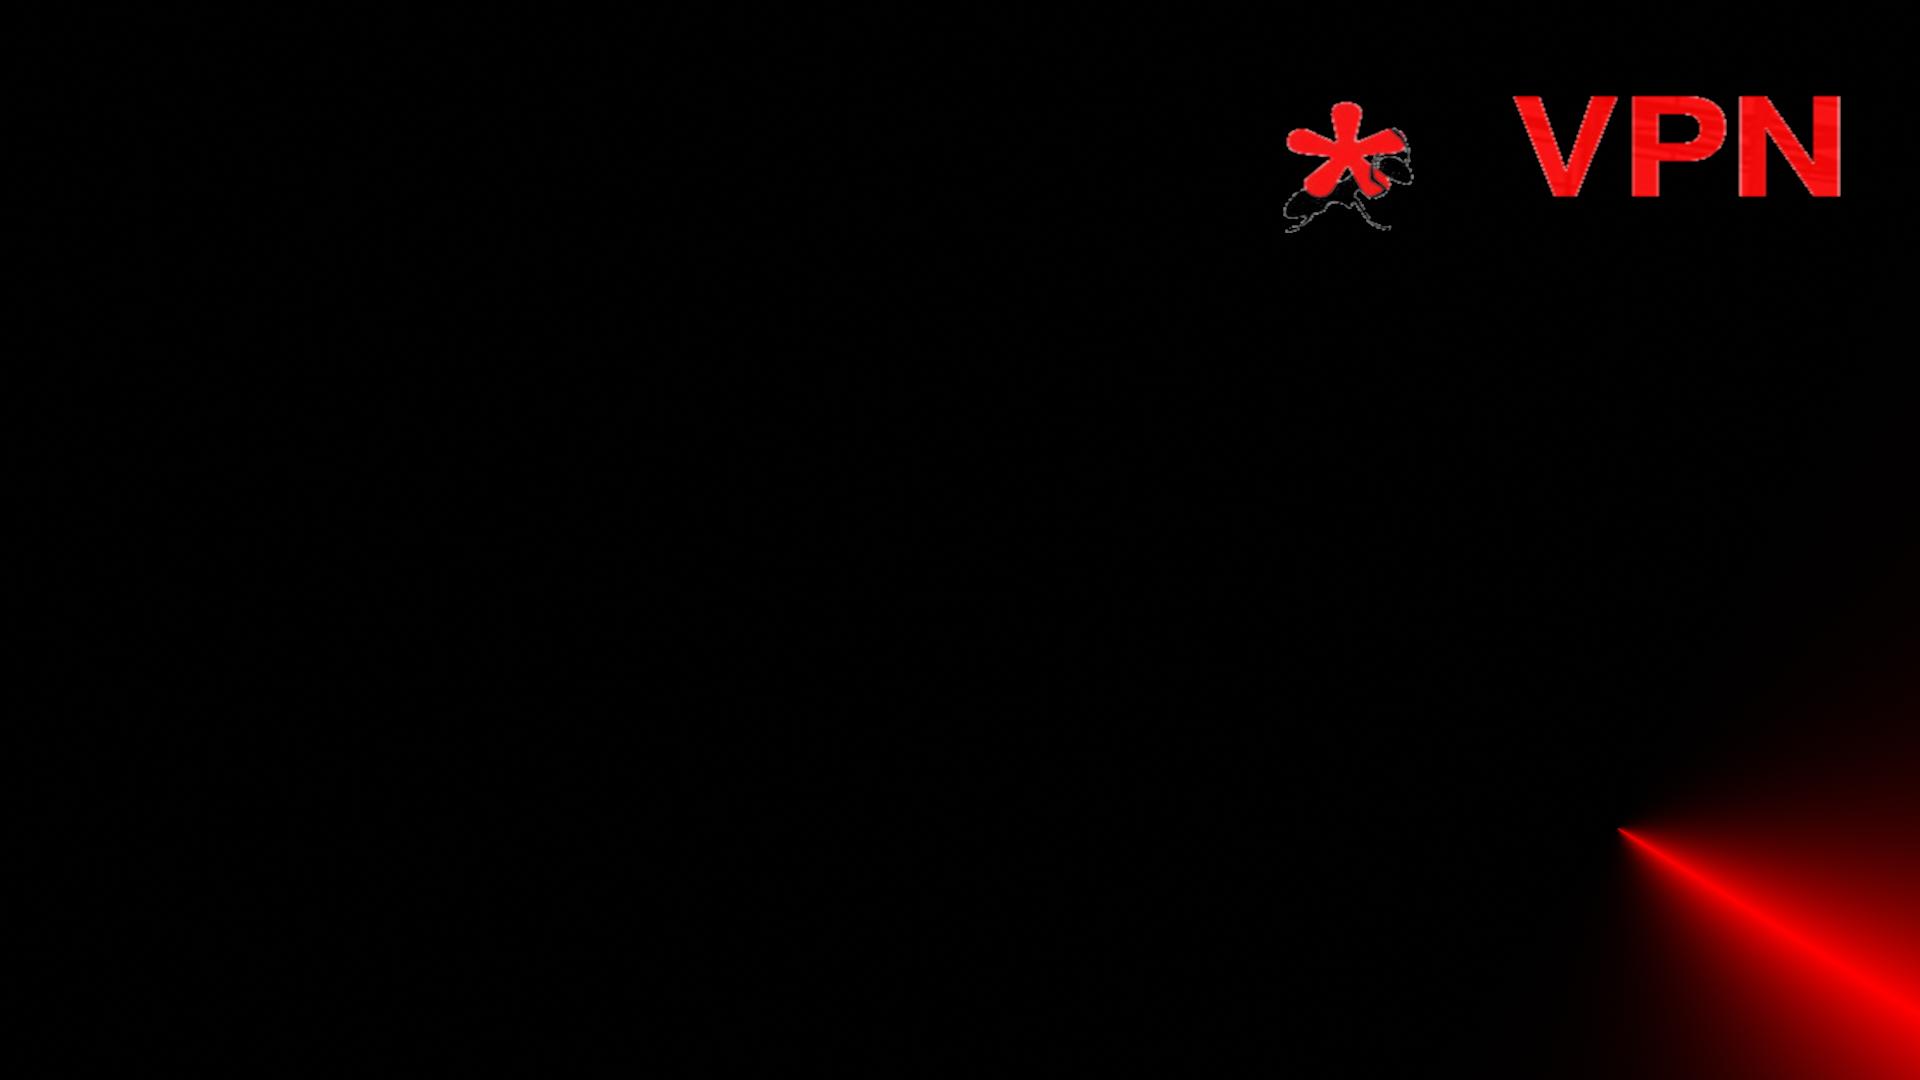 autovpn/static/background.jpg